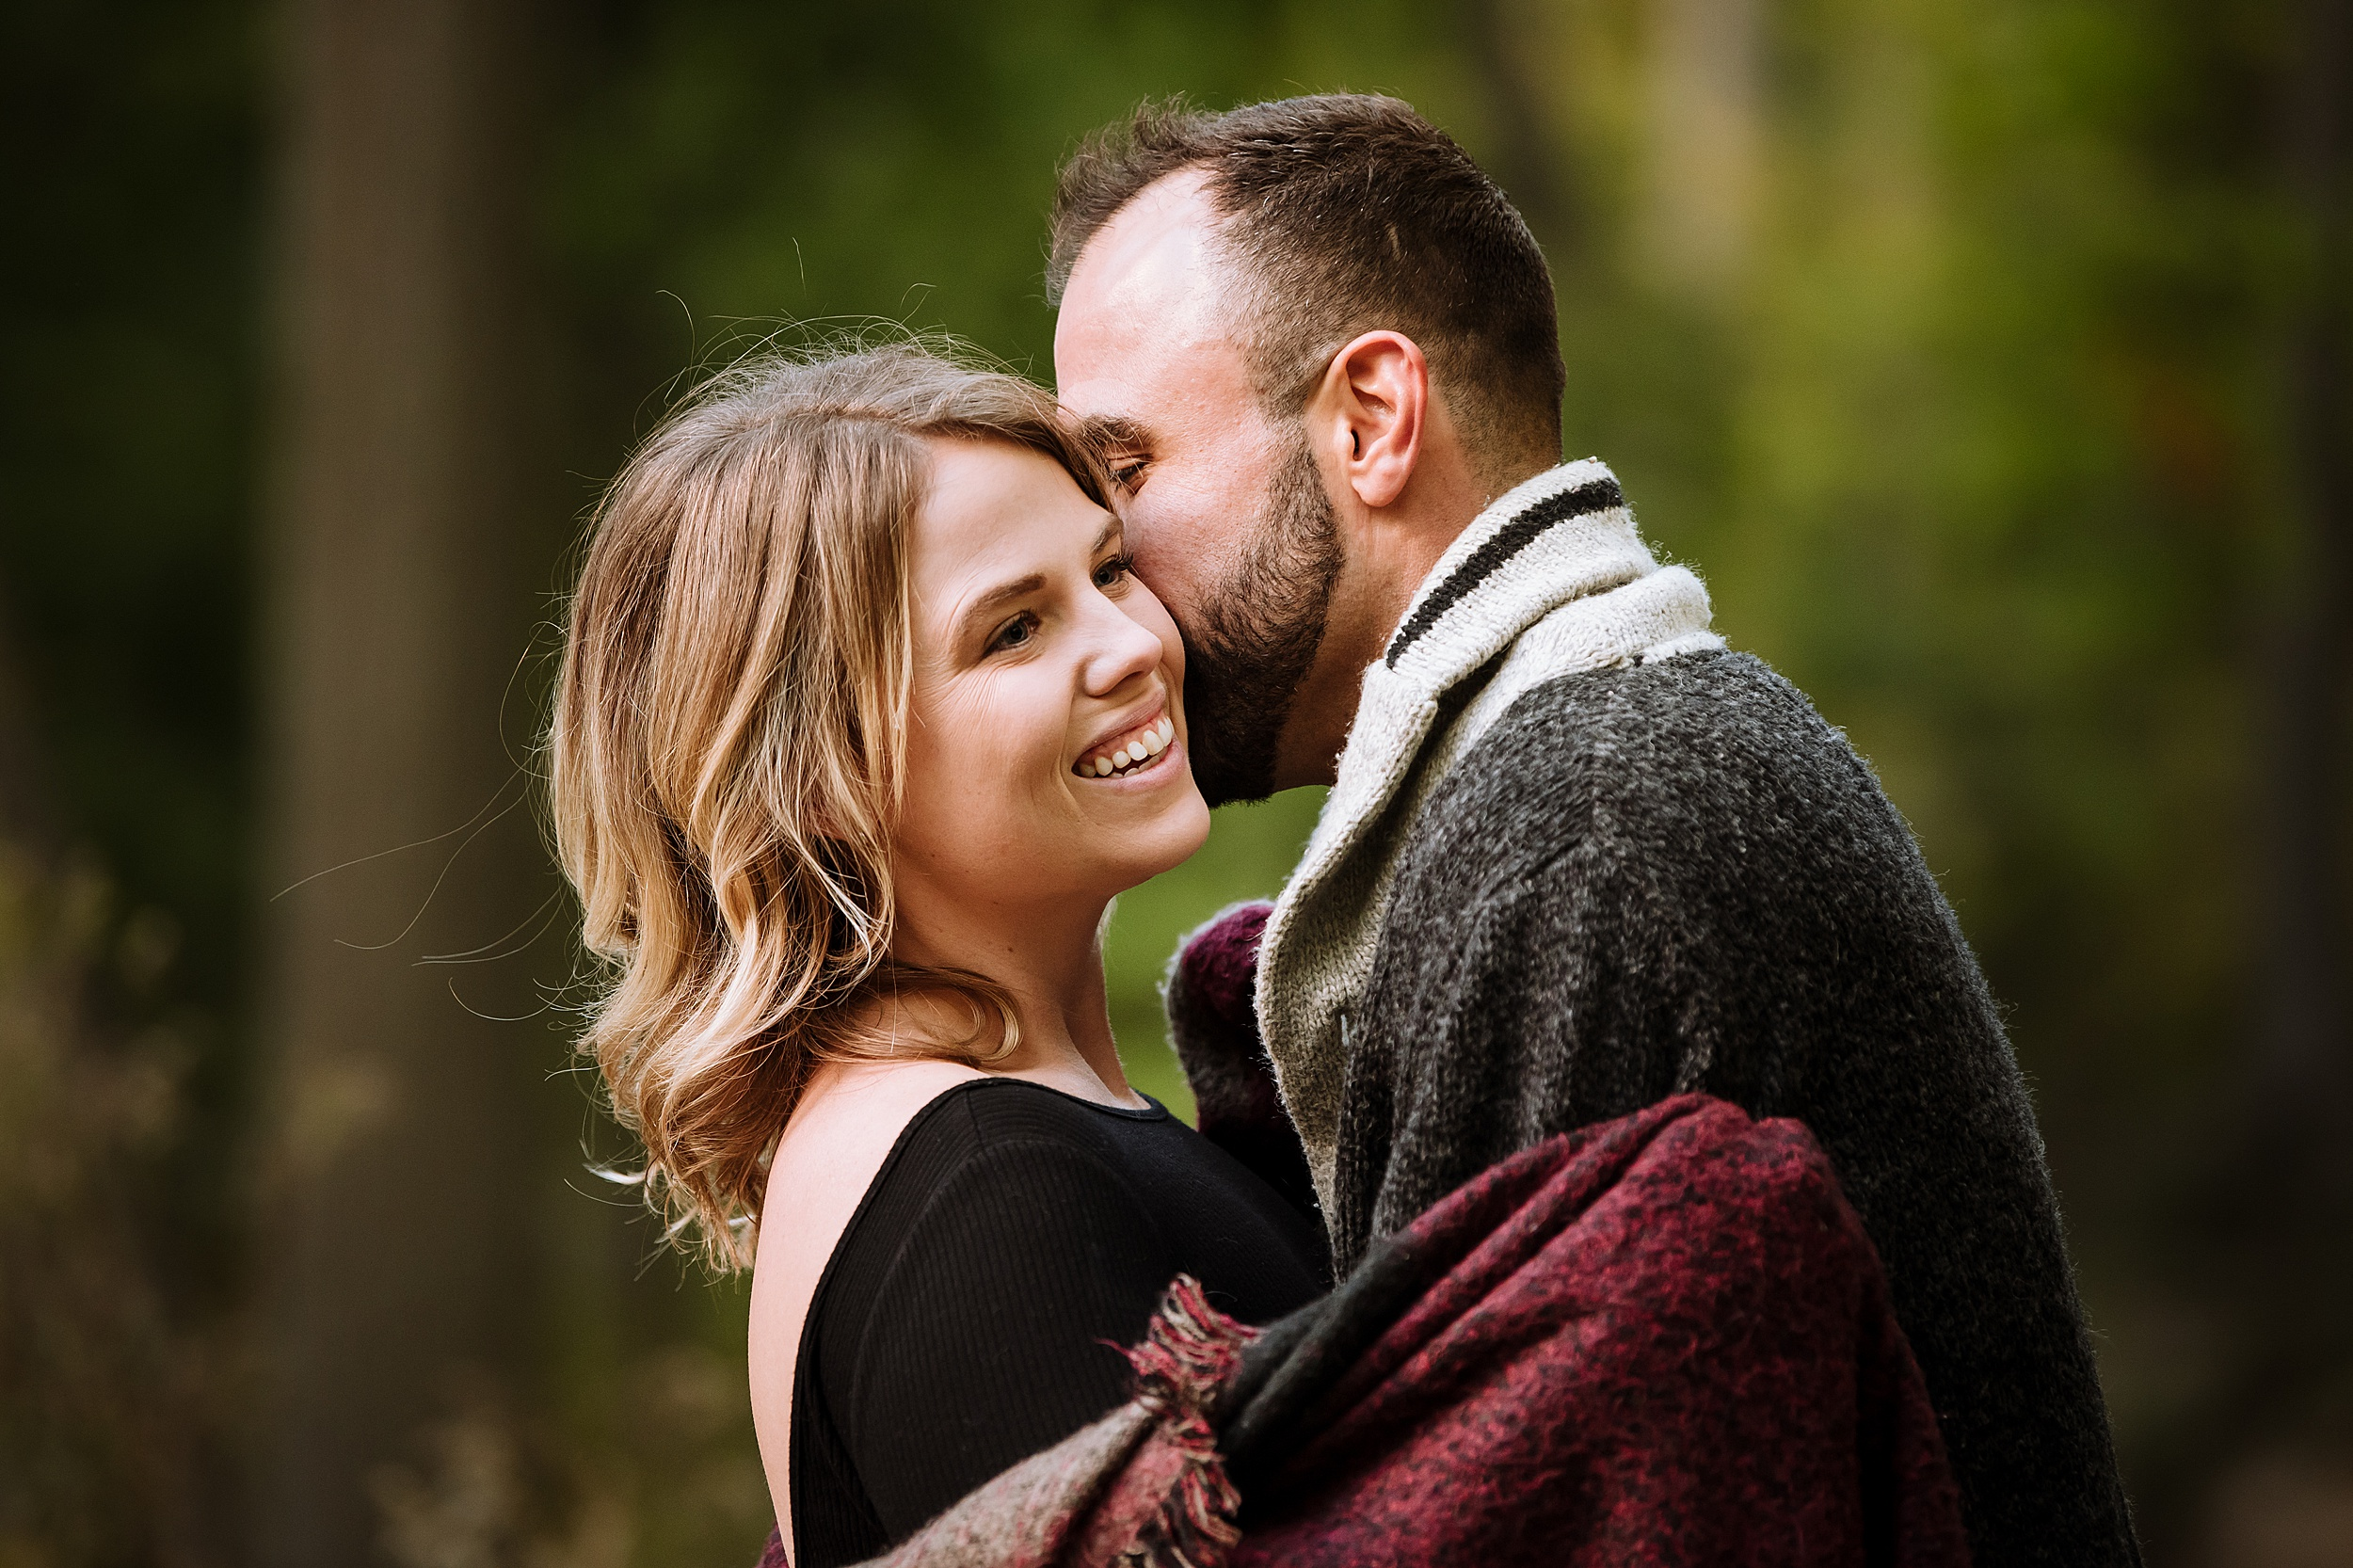 Toronto_Wedding_Photographers_Engagement_Shoot_The_Beaches_005.jpg